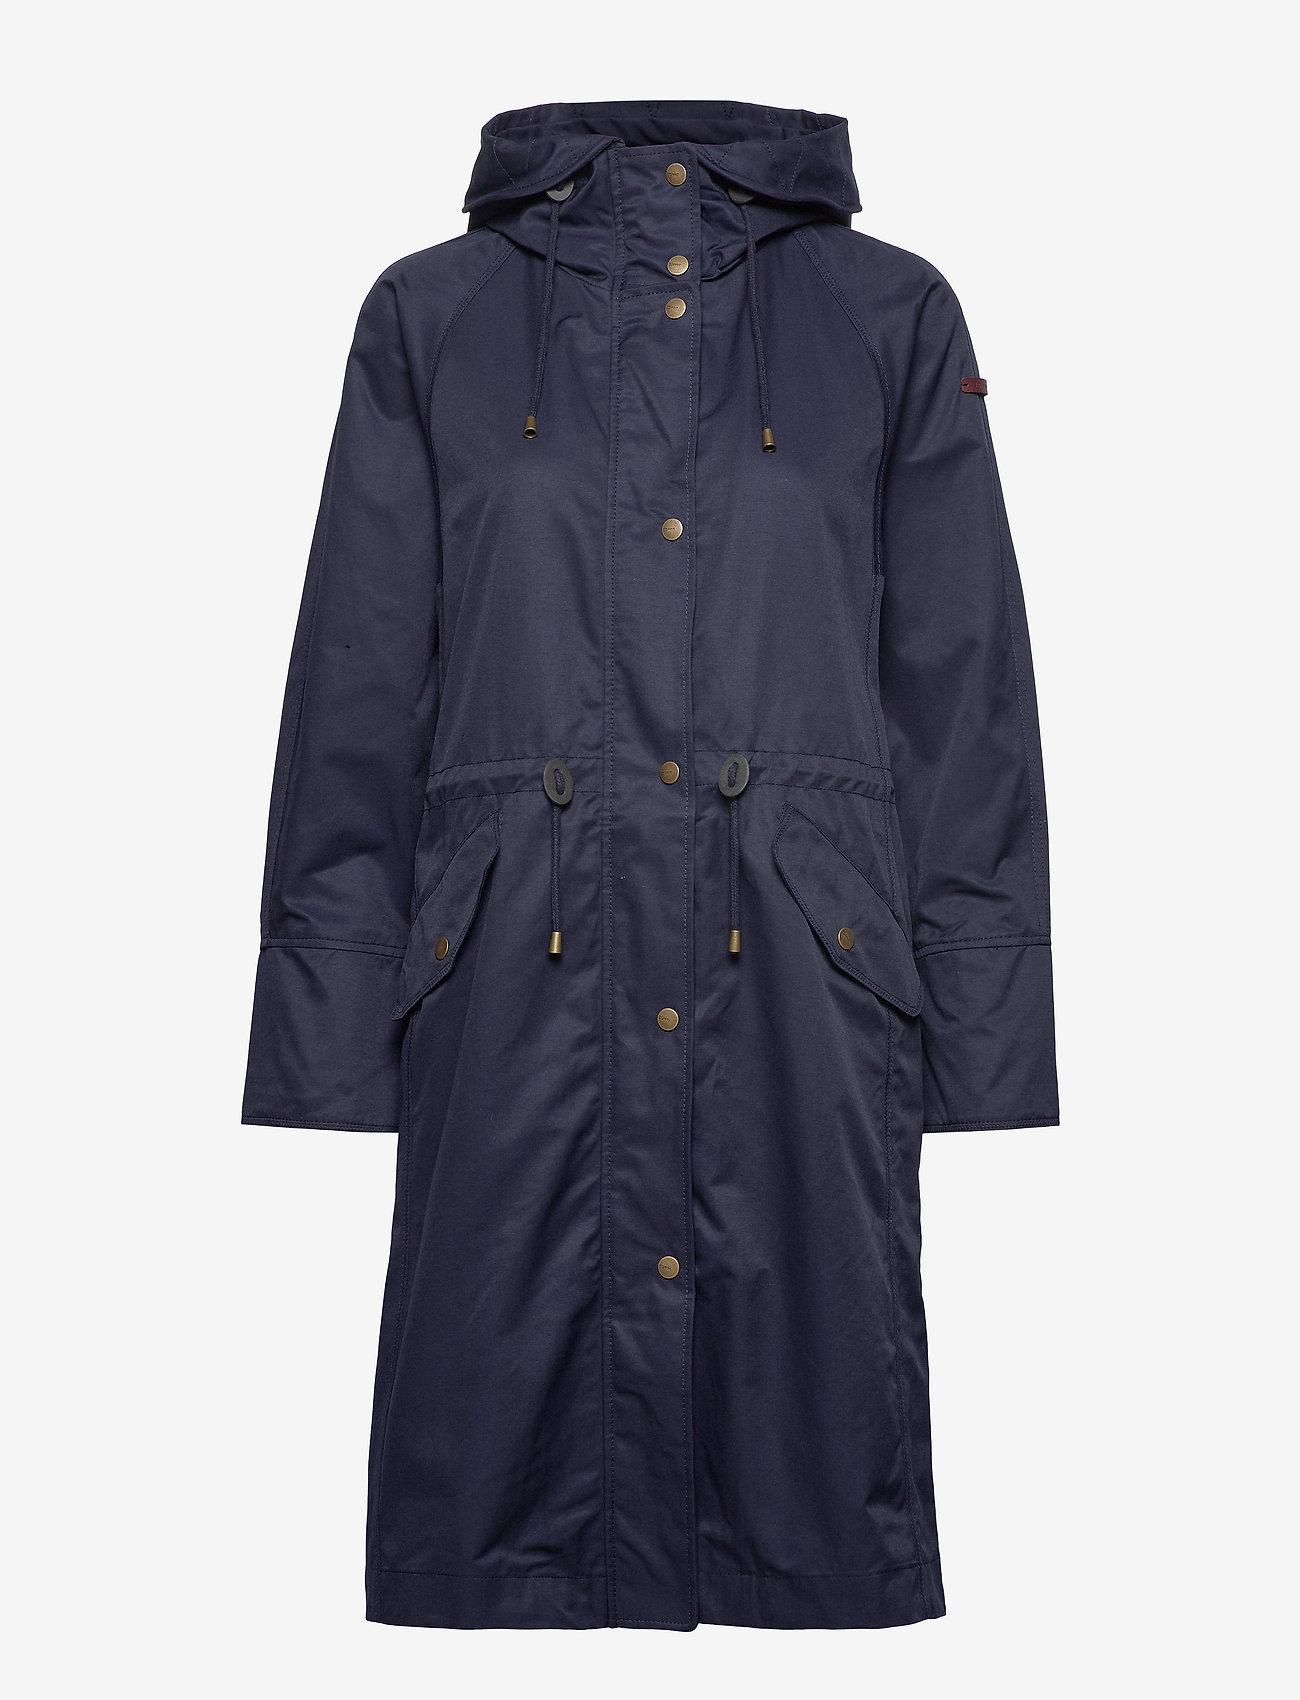 Esprit Casual - Coats woven - cienkie płaszcze - navy - 1